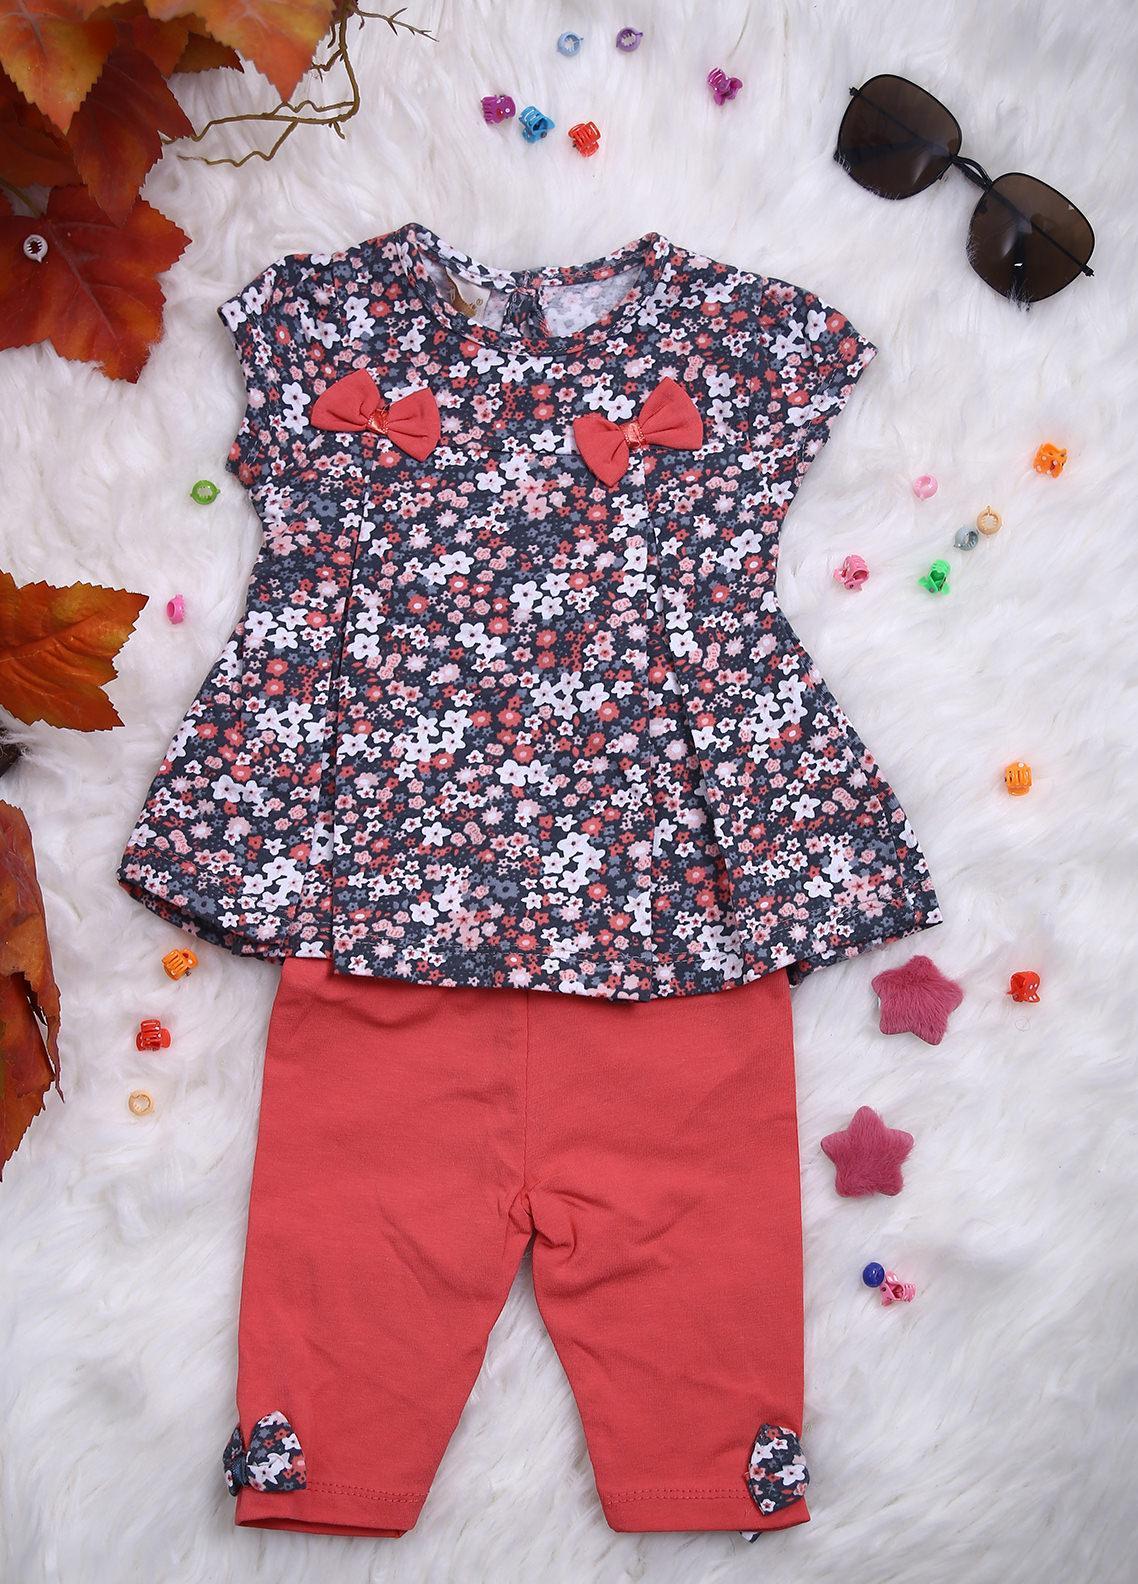 Sanaulla Exclusive Range Cotton Casual 2 Piece for Girls -  112214 Grey